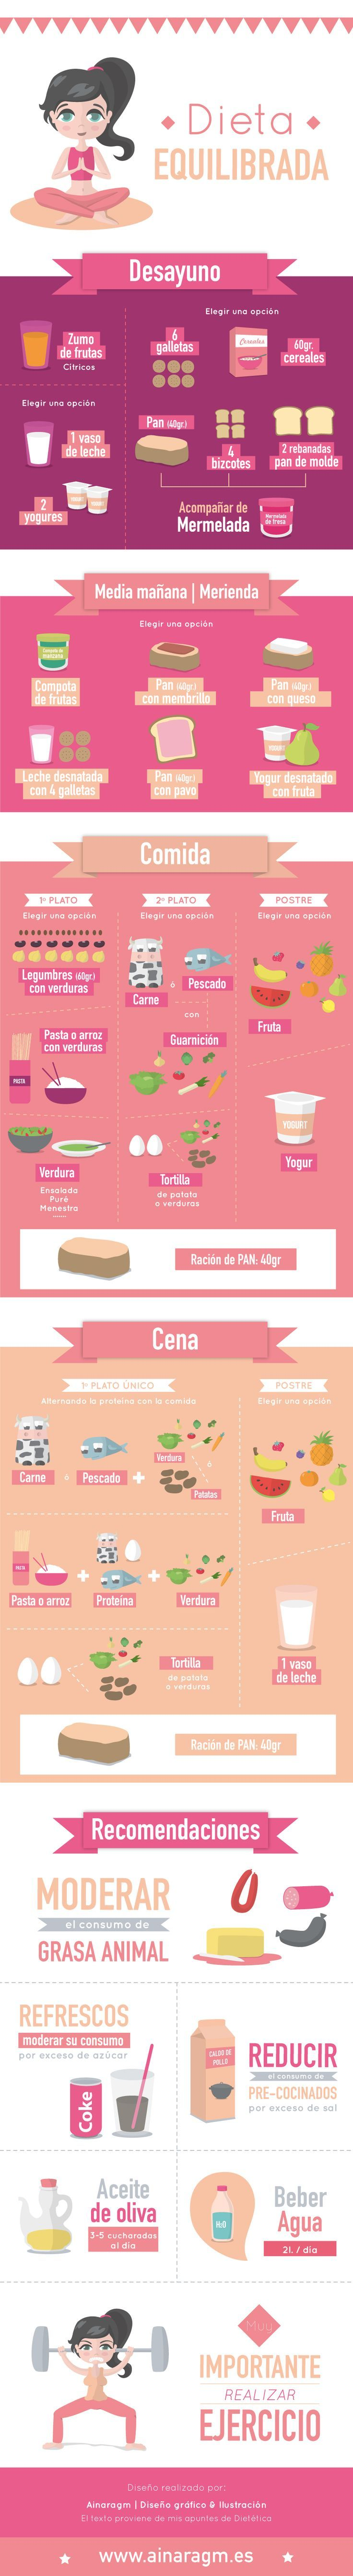 Infrografia de Una Dieta Equilibrada..